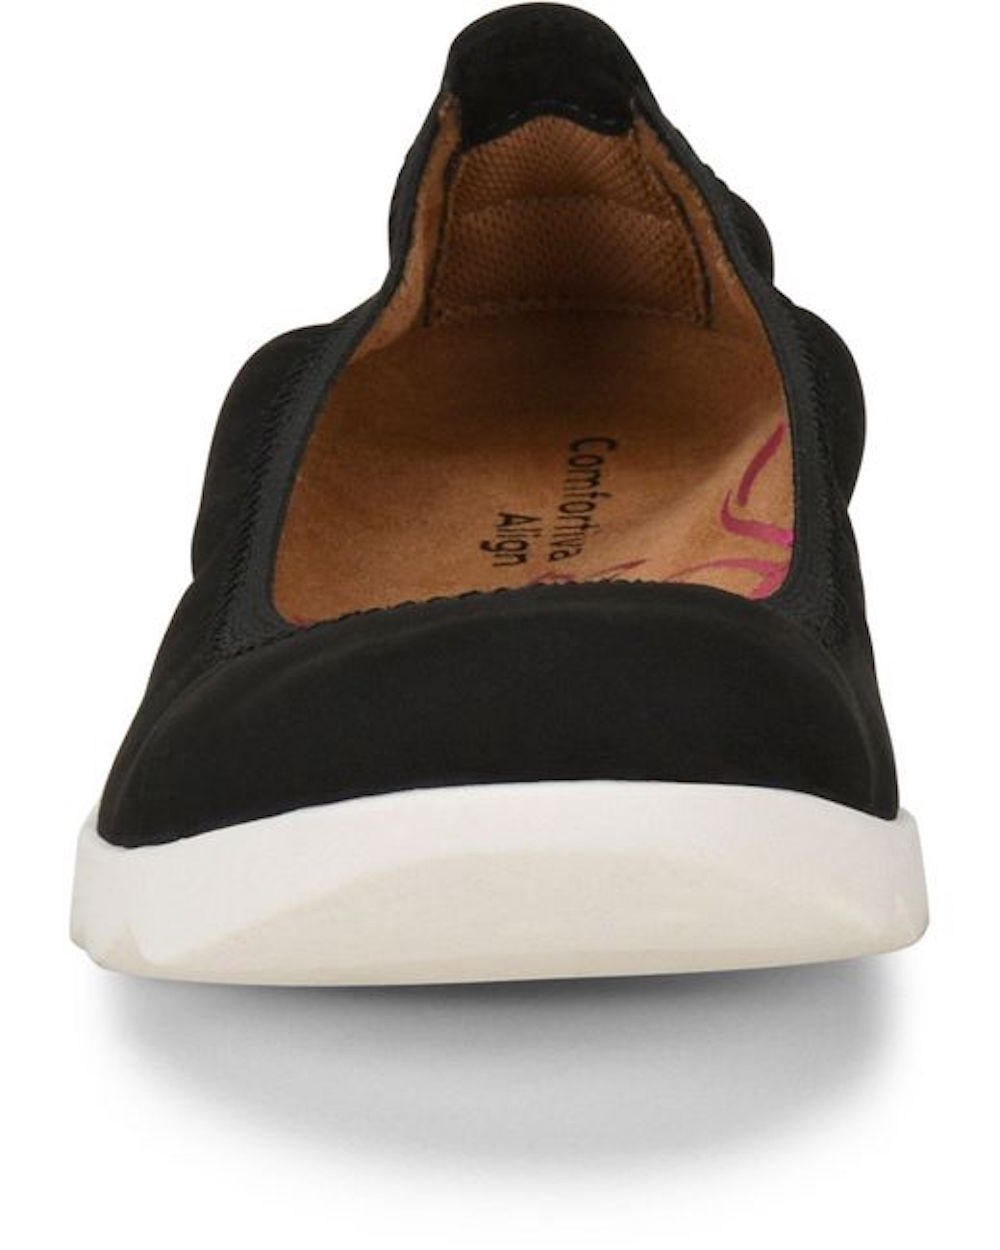 Comfortiva-Womens-Grace-Leather-Closed-Toe-Ballet-Flats thumbnail 7